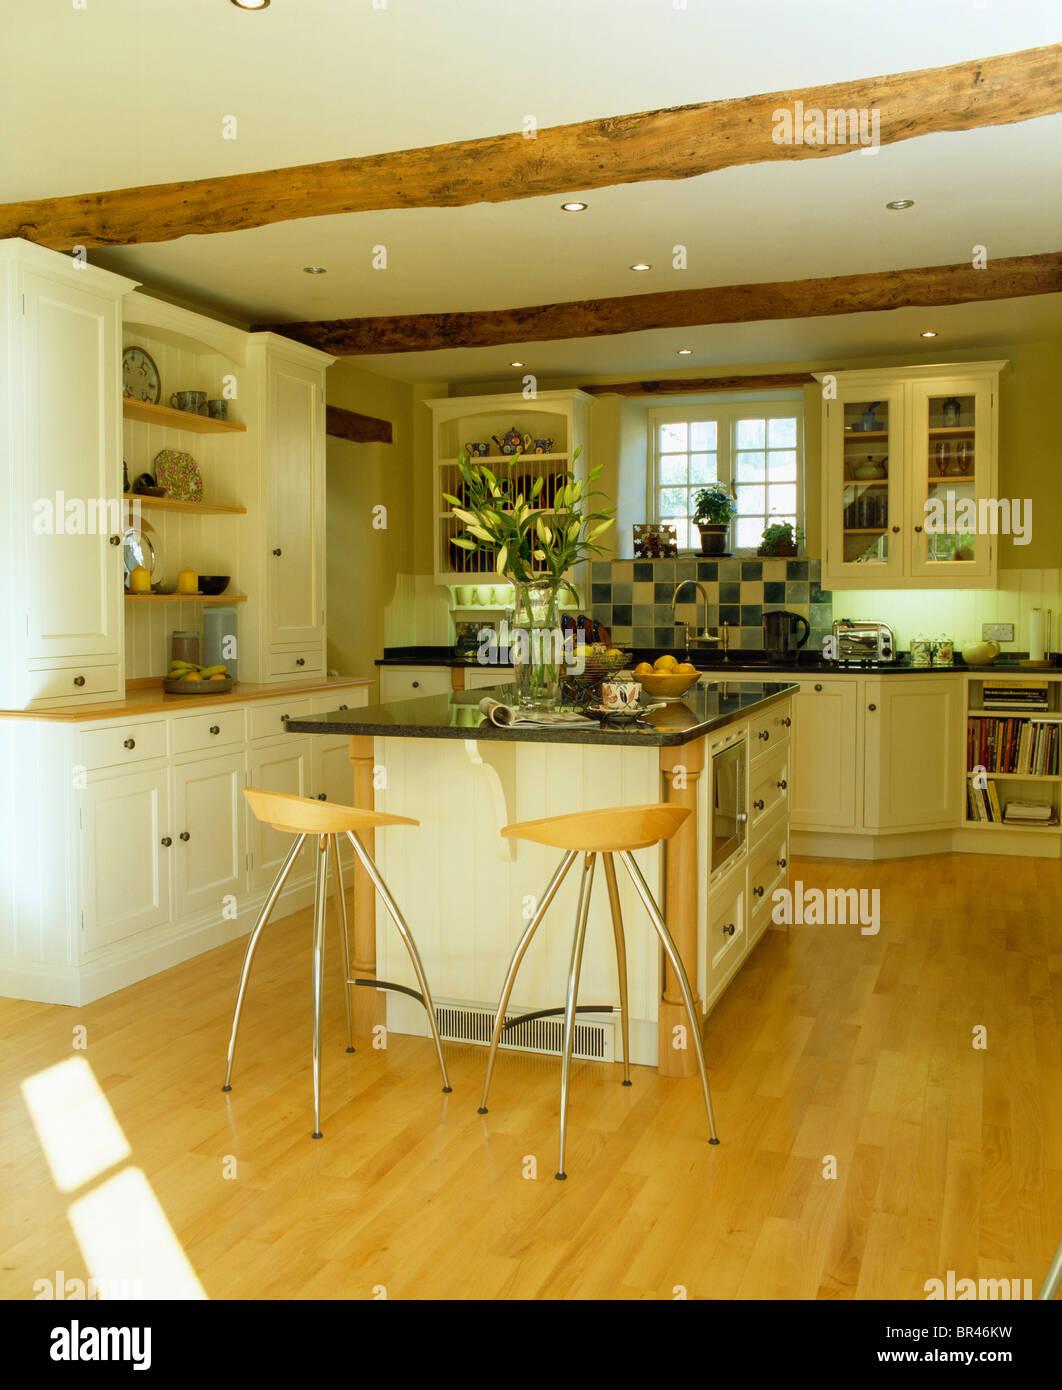 Interiors Modern Kitchens Island Units Stockfotos & Interiors Modern ...